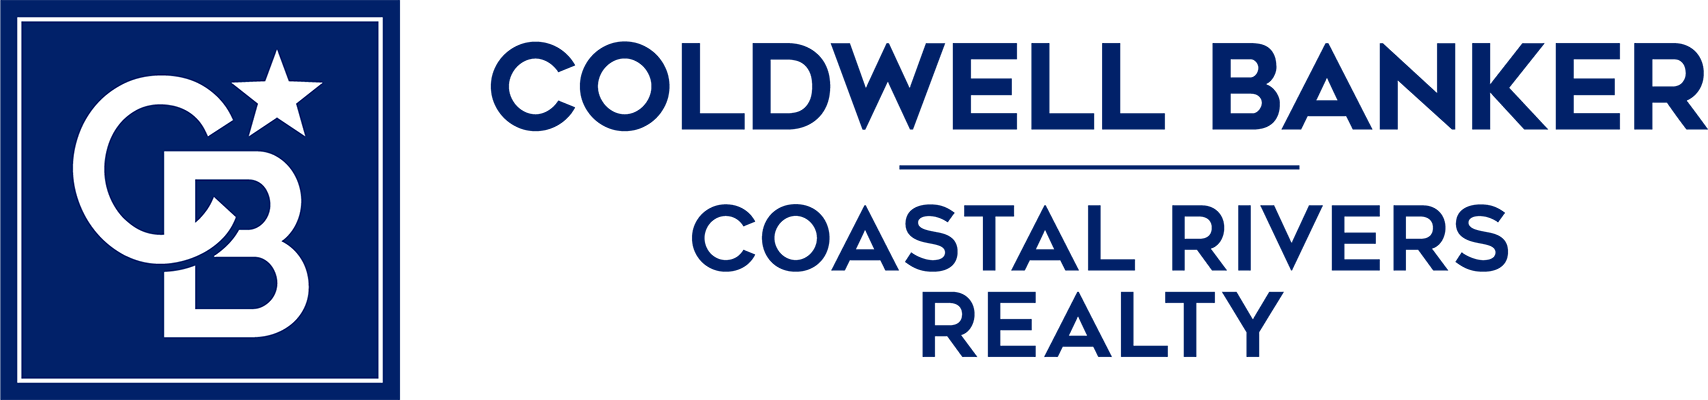 Rachel Fitzsimons - Coldwell Banker Coastal Rivers Logo